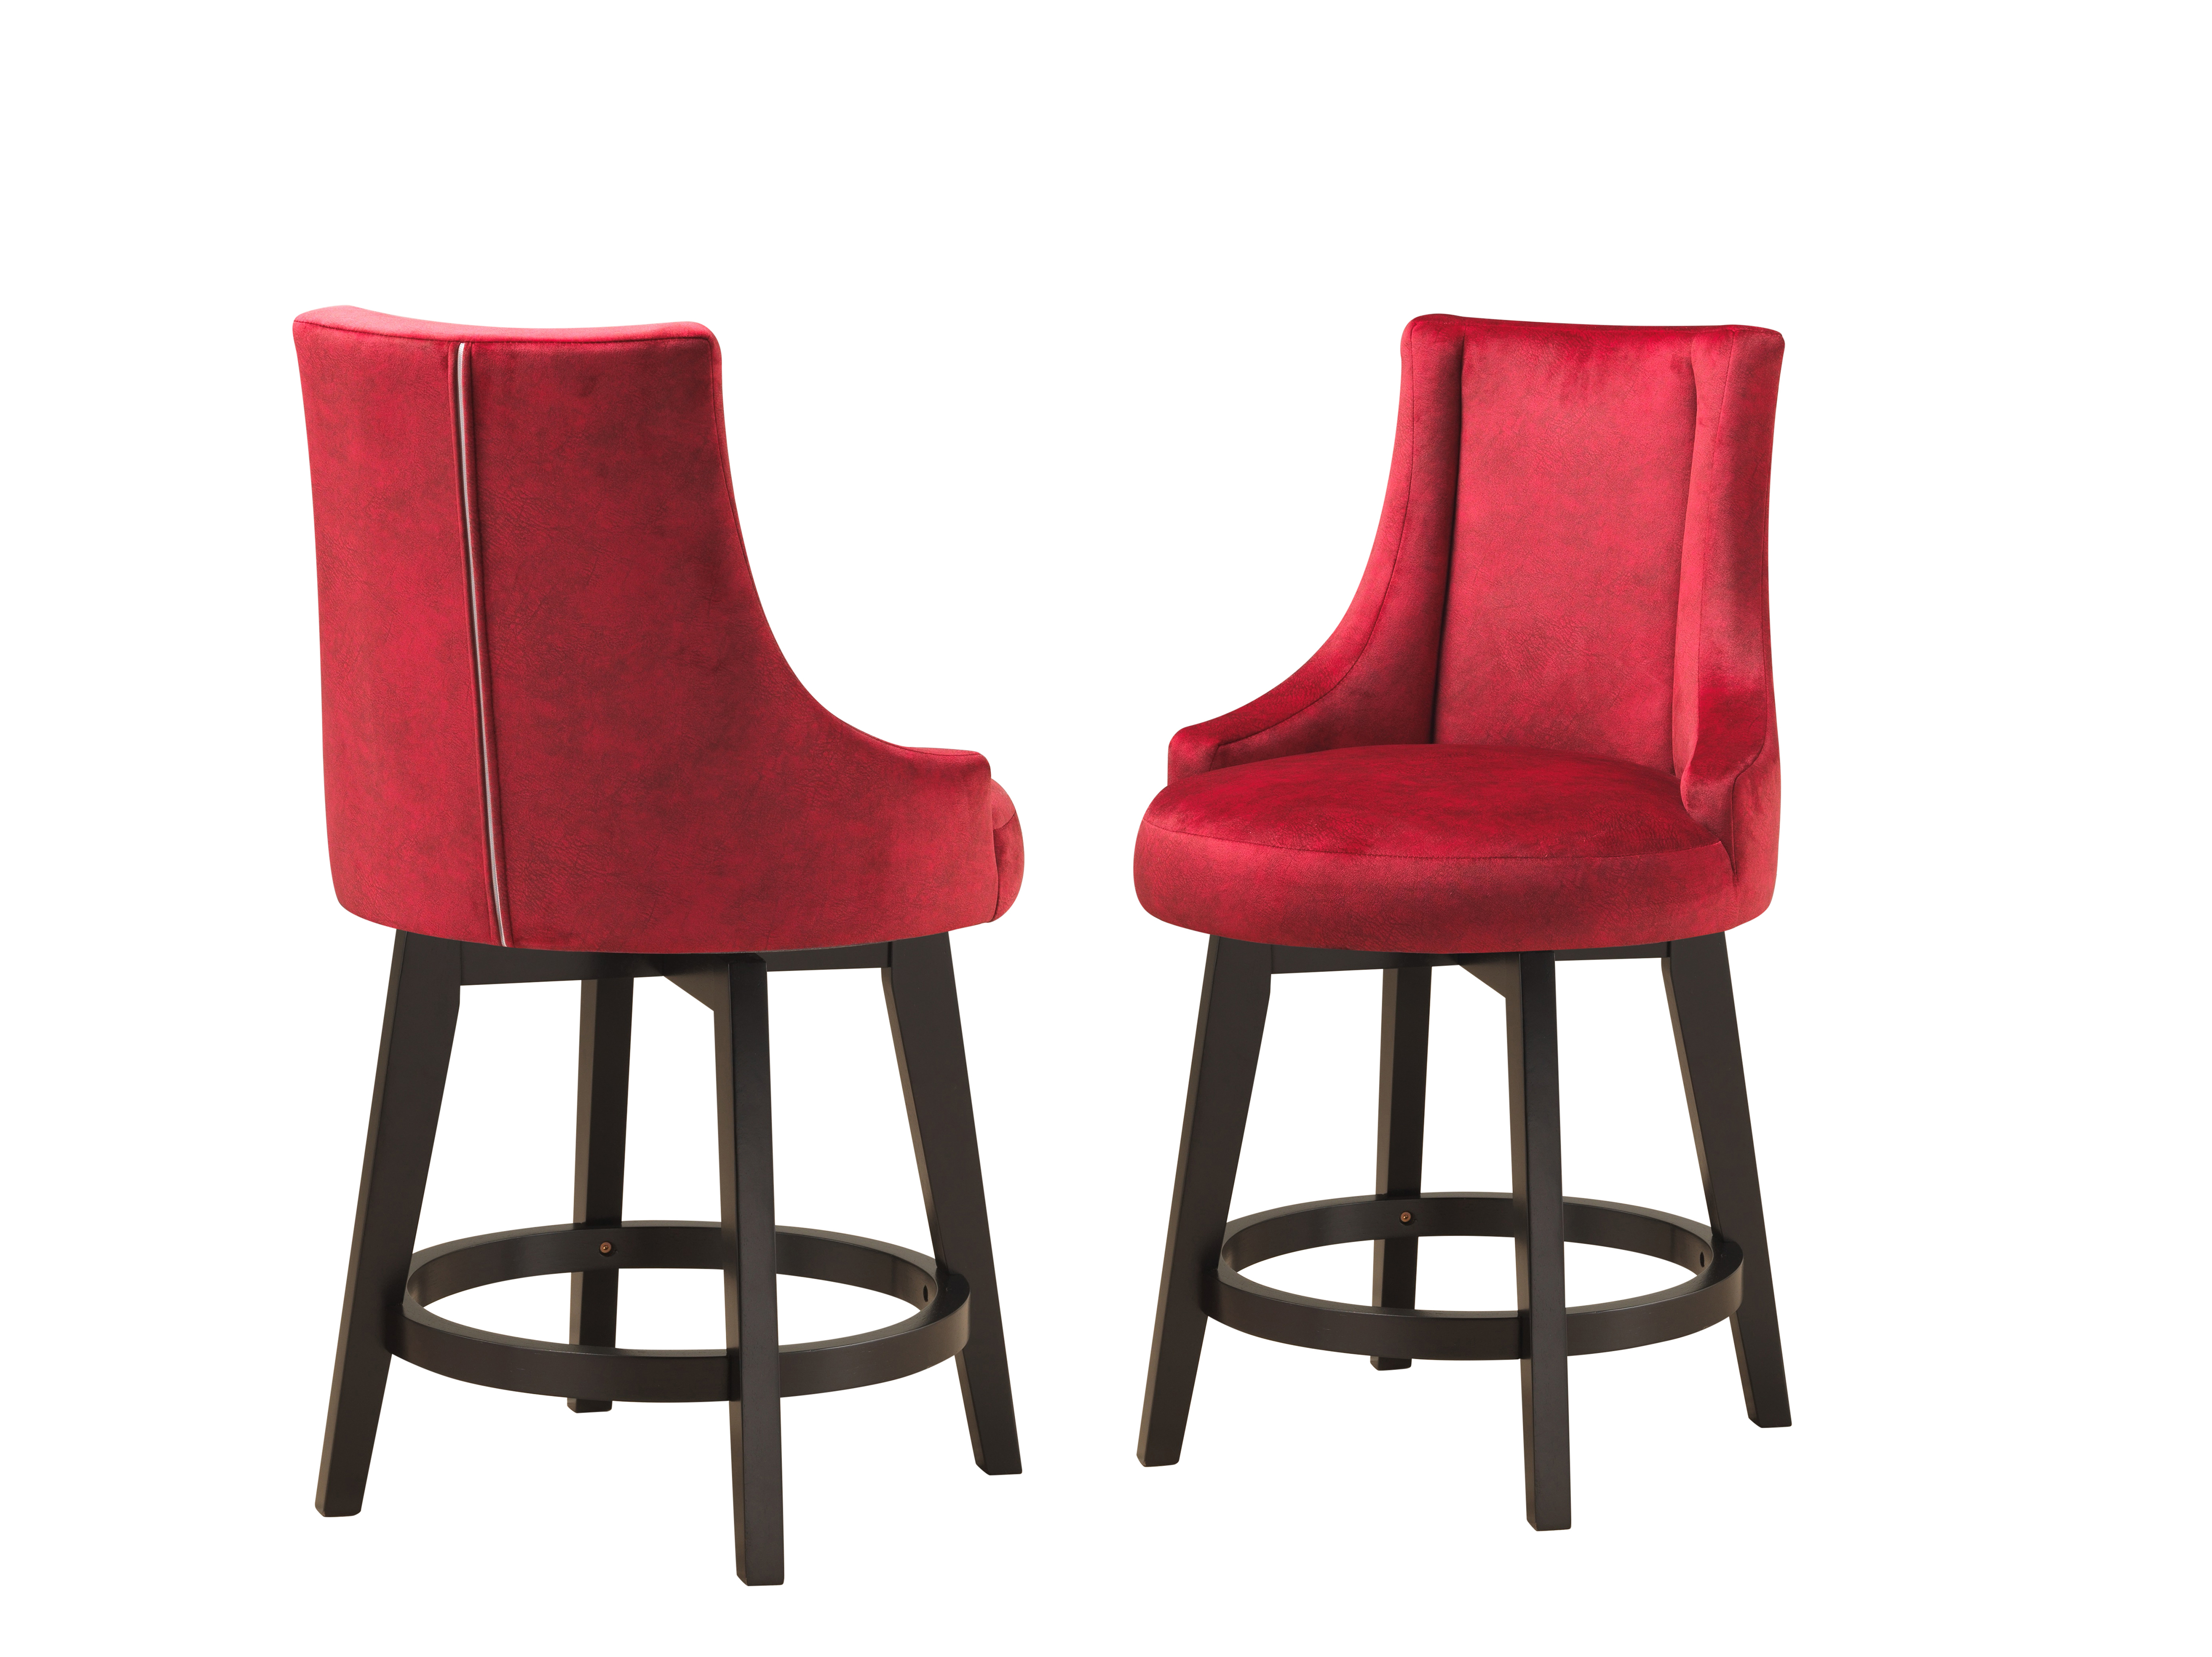 Groovy Walden 25H Swivel Counter Height Bar Stools Red Fabric Cappuccino Wood Legs Set Of 2 Uwap Interior Chair Design Uwaporg